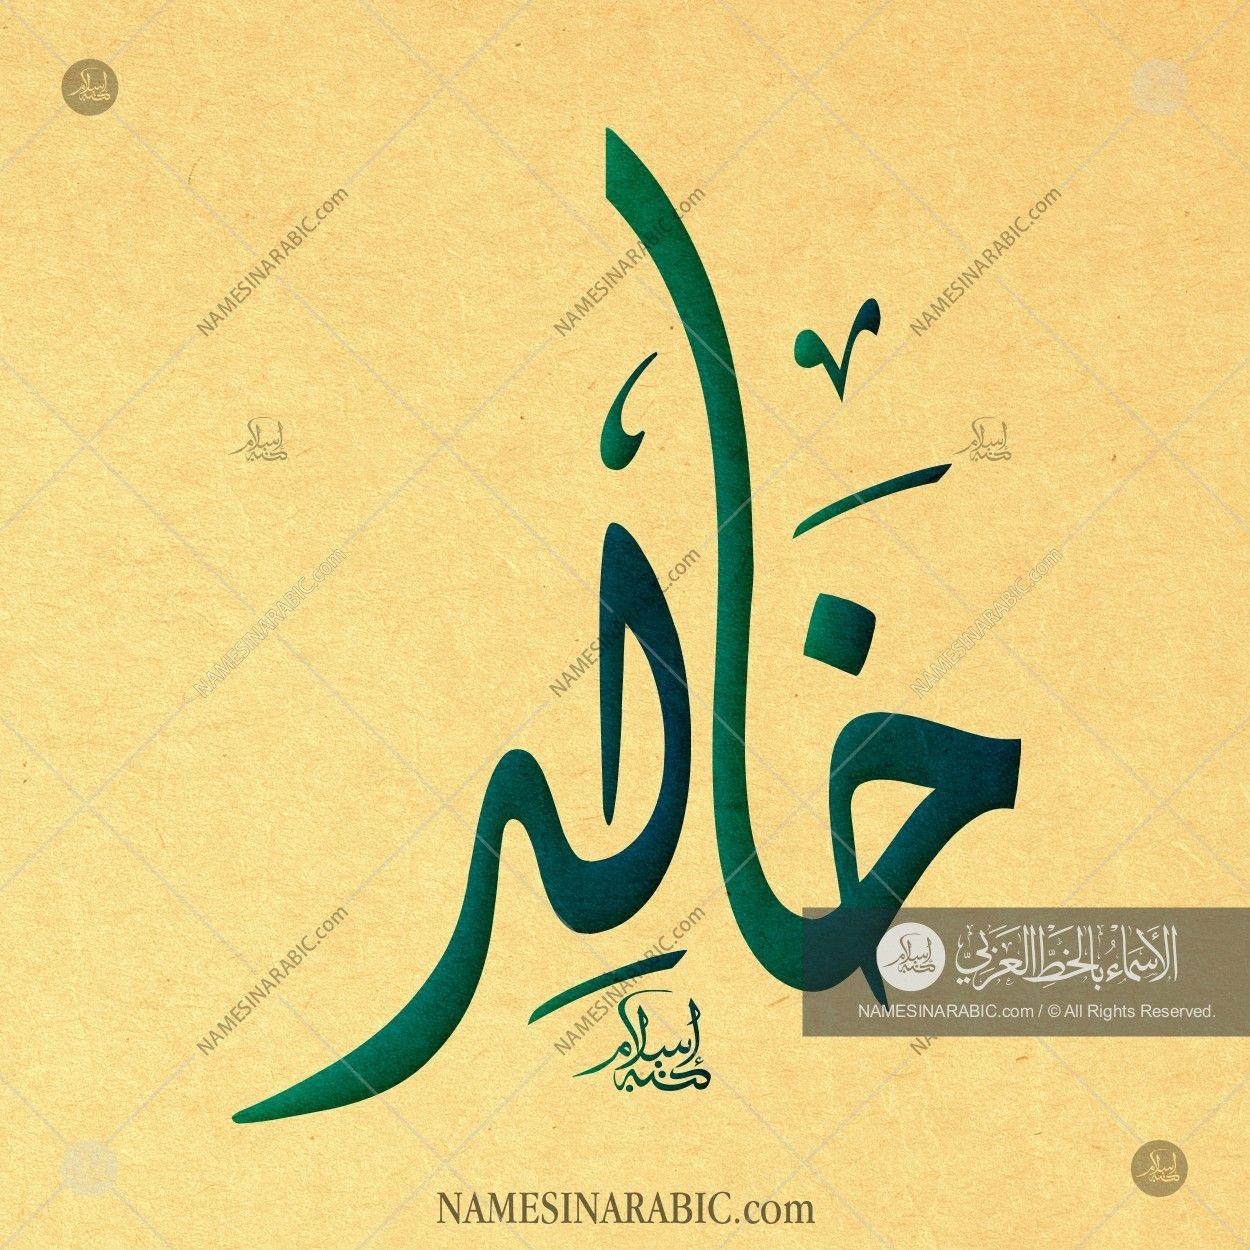 Khalid Name In Arabic Calligraphy Calligraphy Calligraphy Name Names